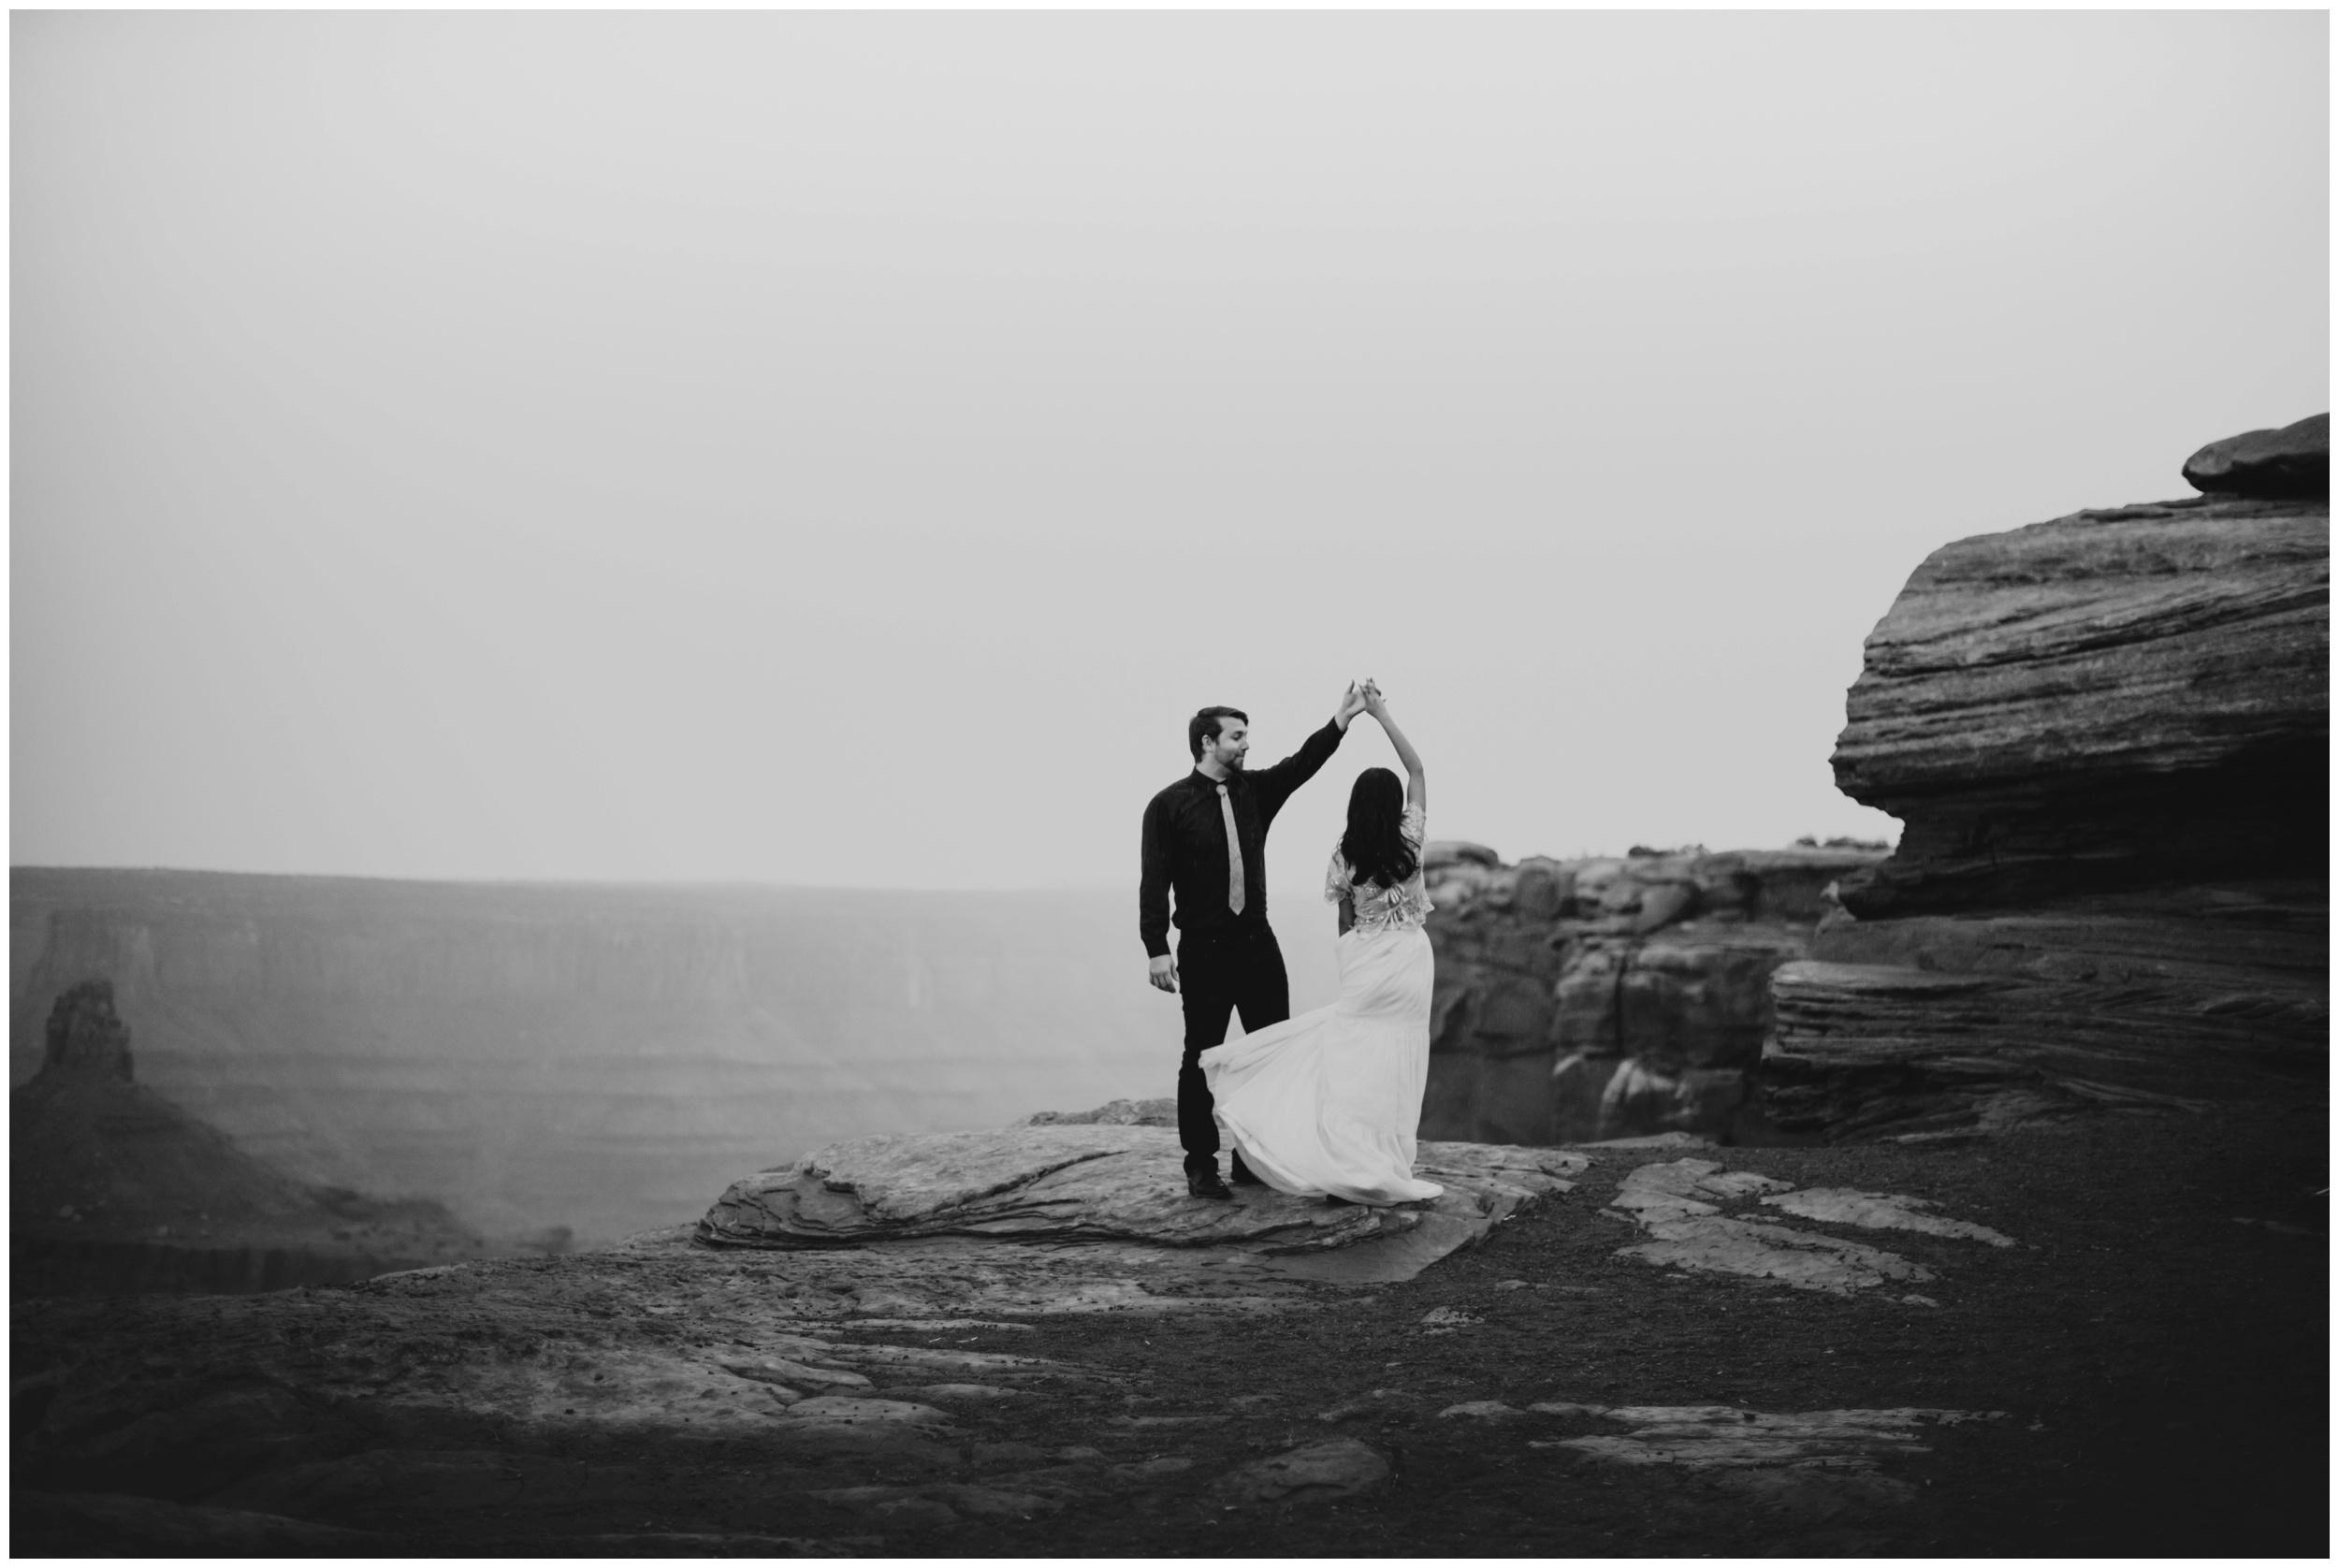 couple dancing on the rocks at dead horse point overlook | Elopement Photographer www.riversandroadsphotography.com